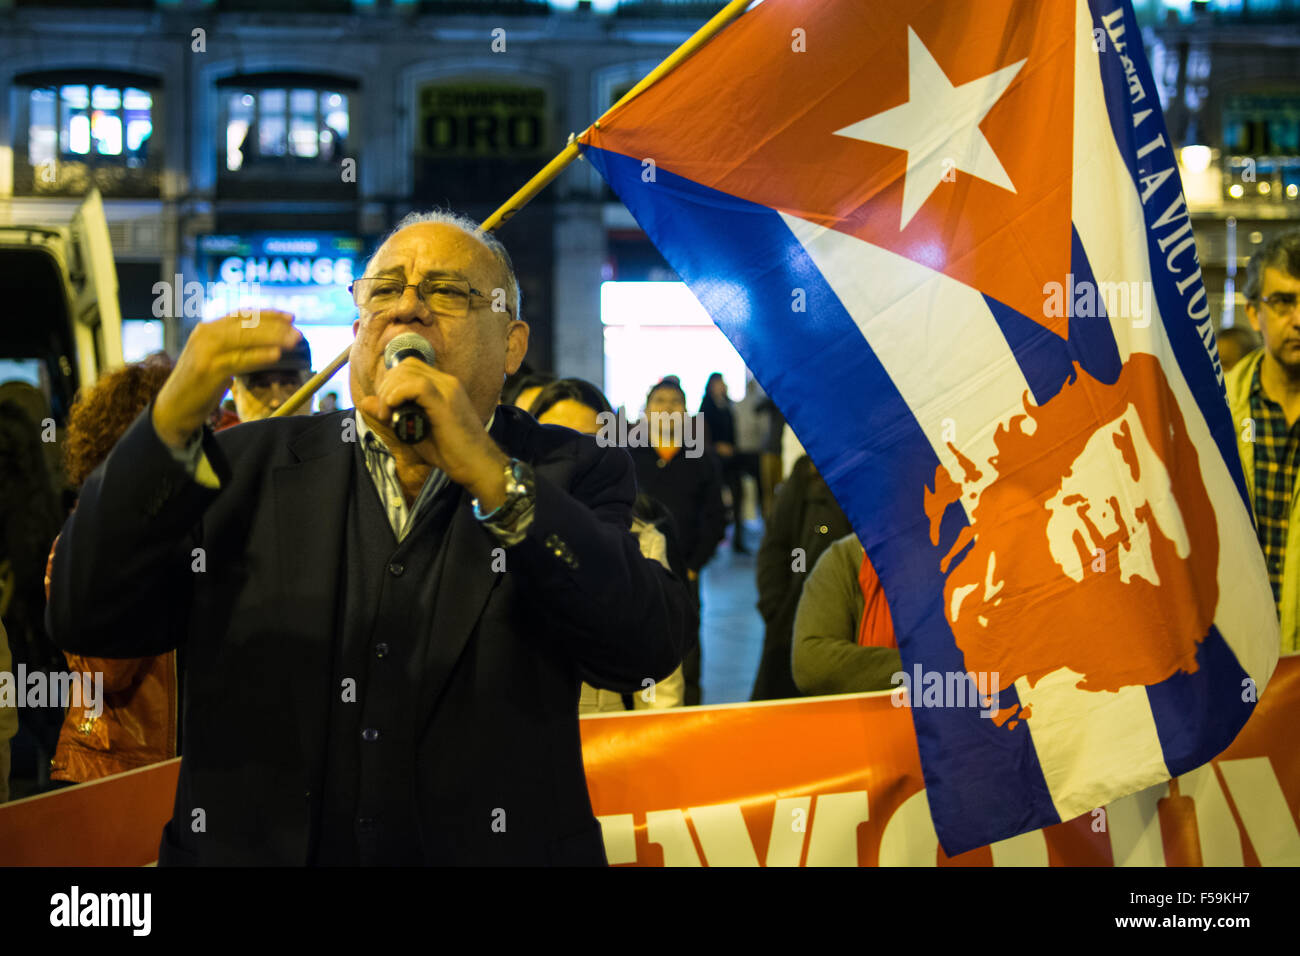 Madrid, Spain. 30th Oct, 2015. Mario Ricardo Isea, Ambassador of Venezuela in Spain, speaks to the crowd during - Stock Image